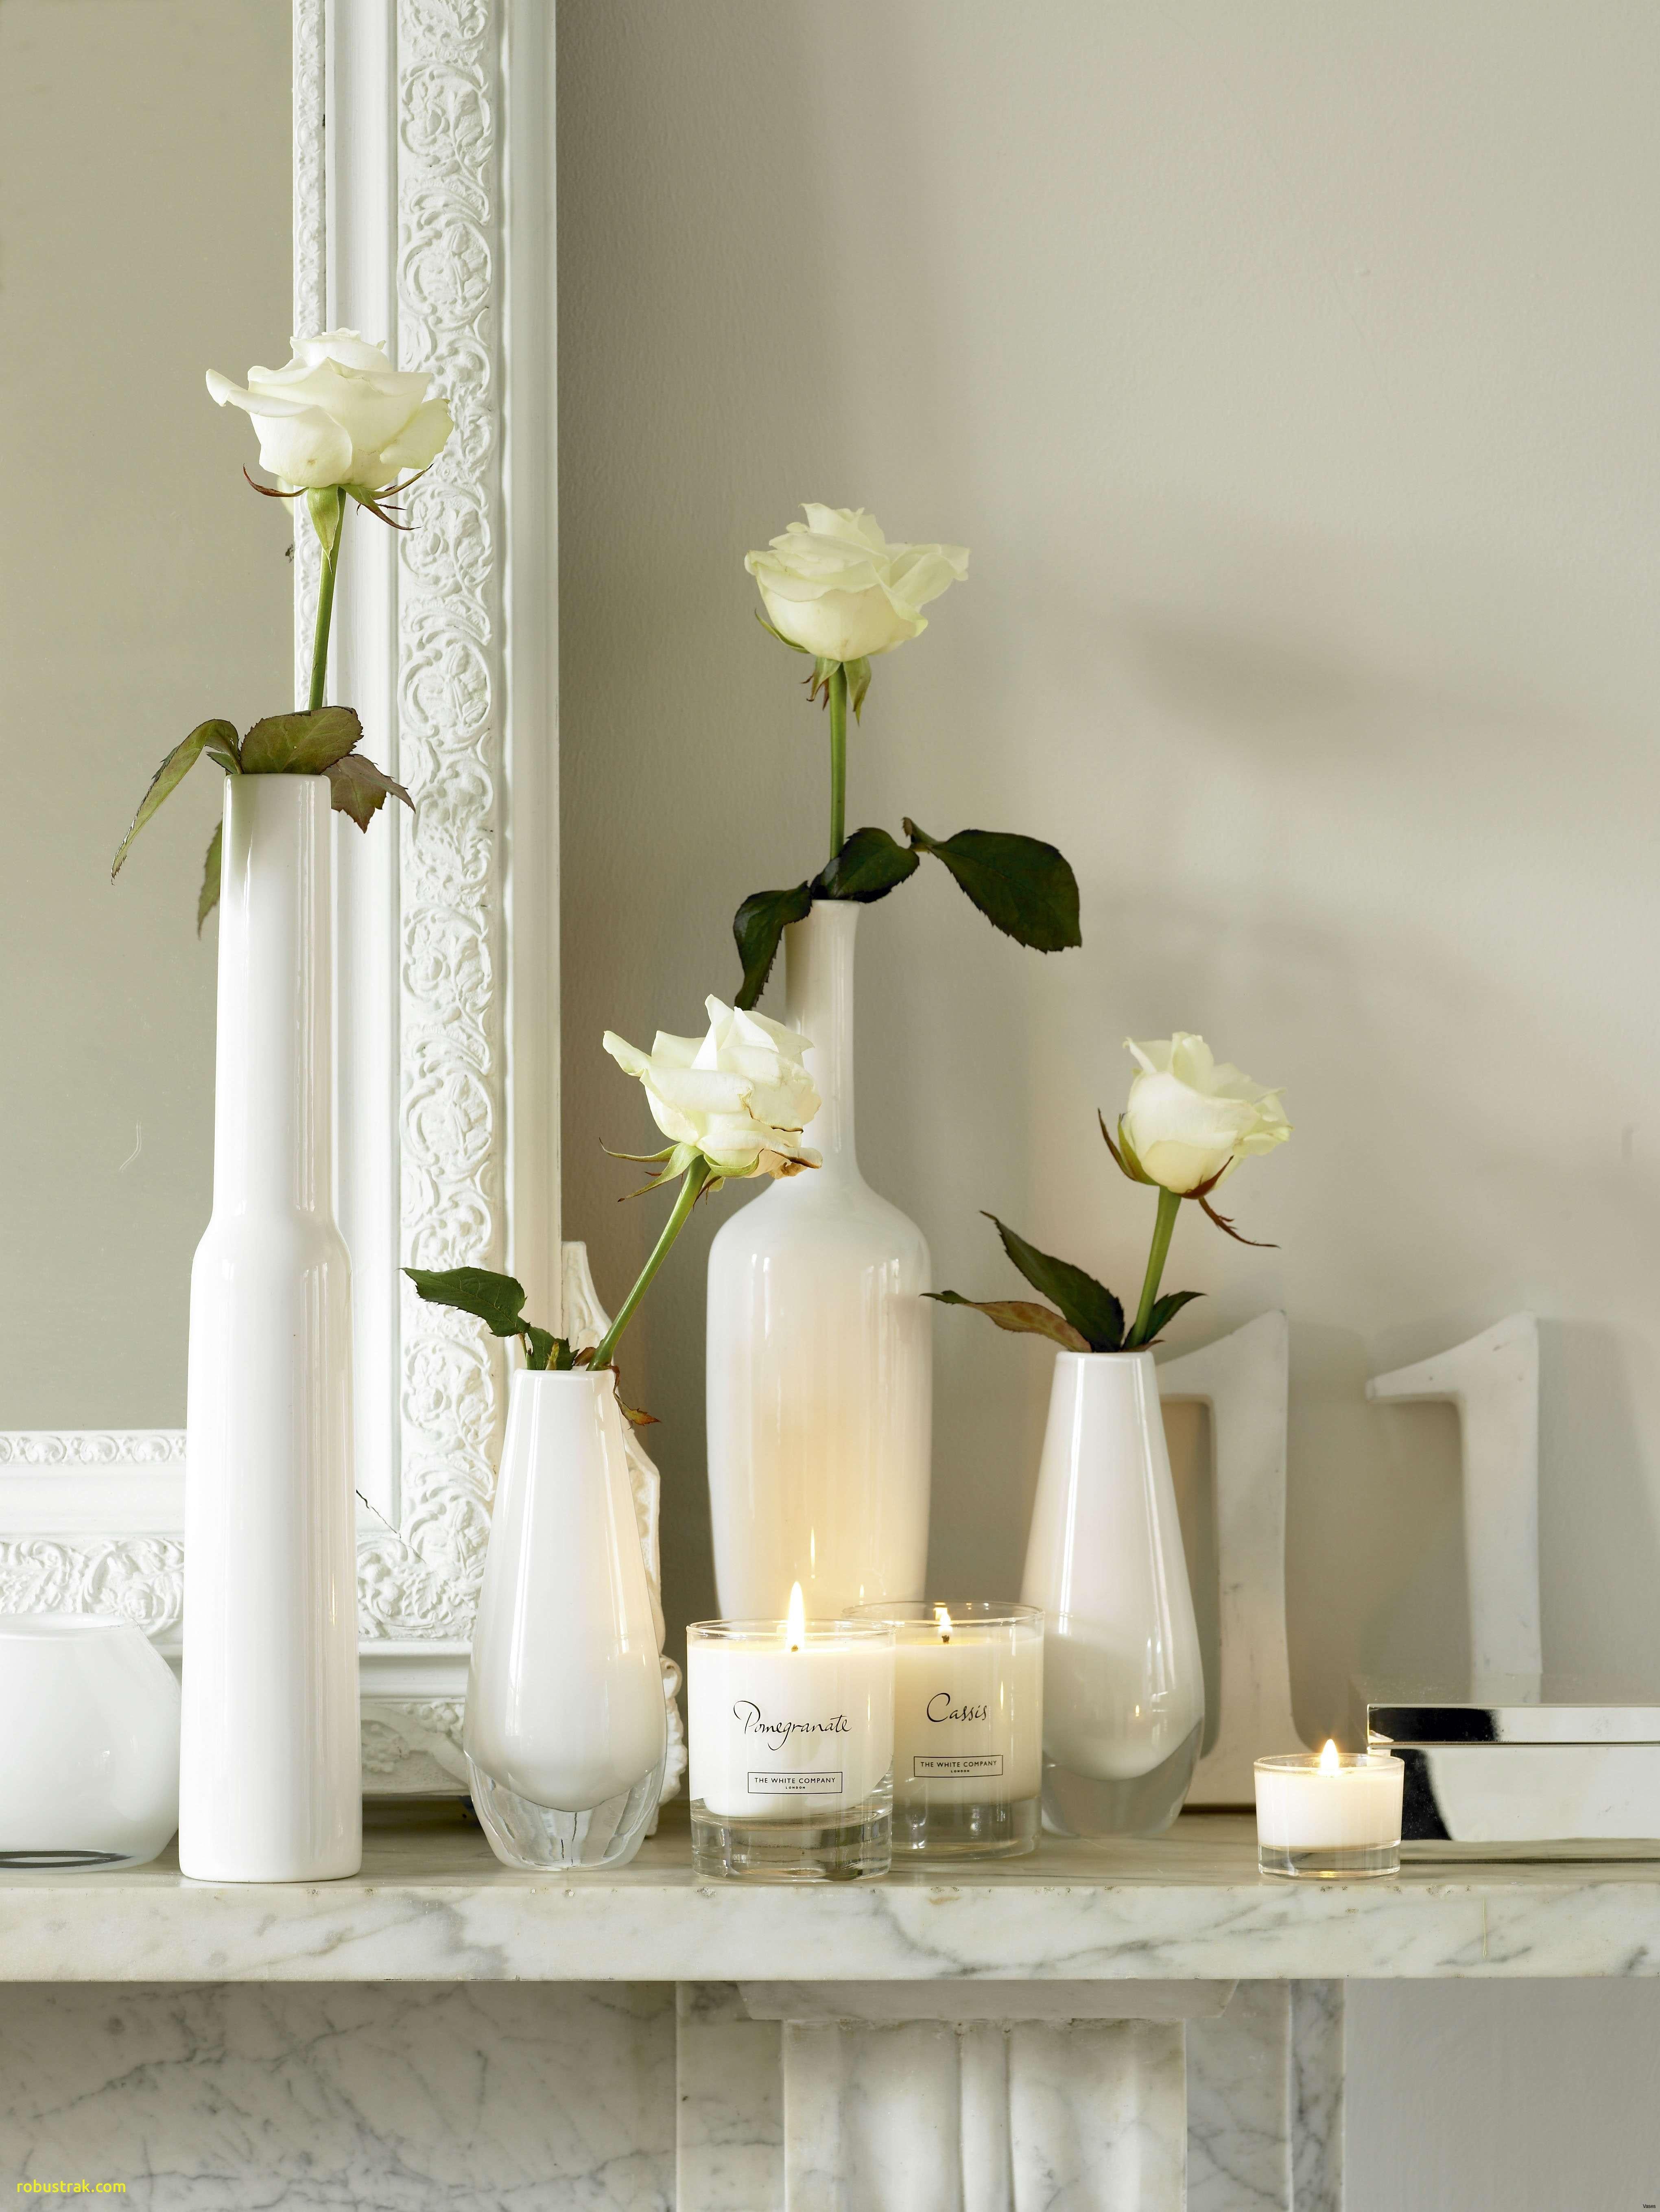 long vase decoration ideas of elegant decorating with vases home design ideas within vases decoration 15 ideas decorating with vasesi 15d vases decoration h decorationi 0d